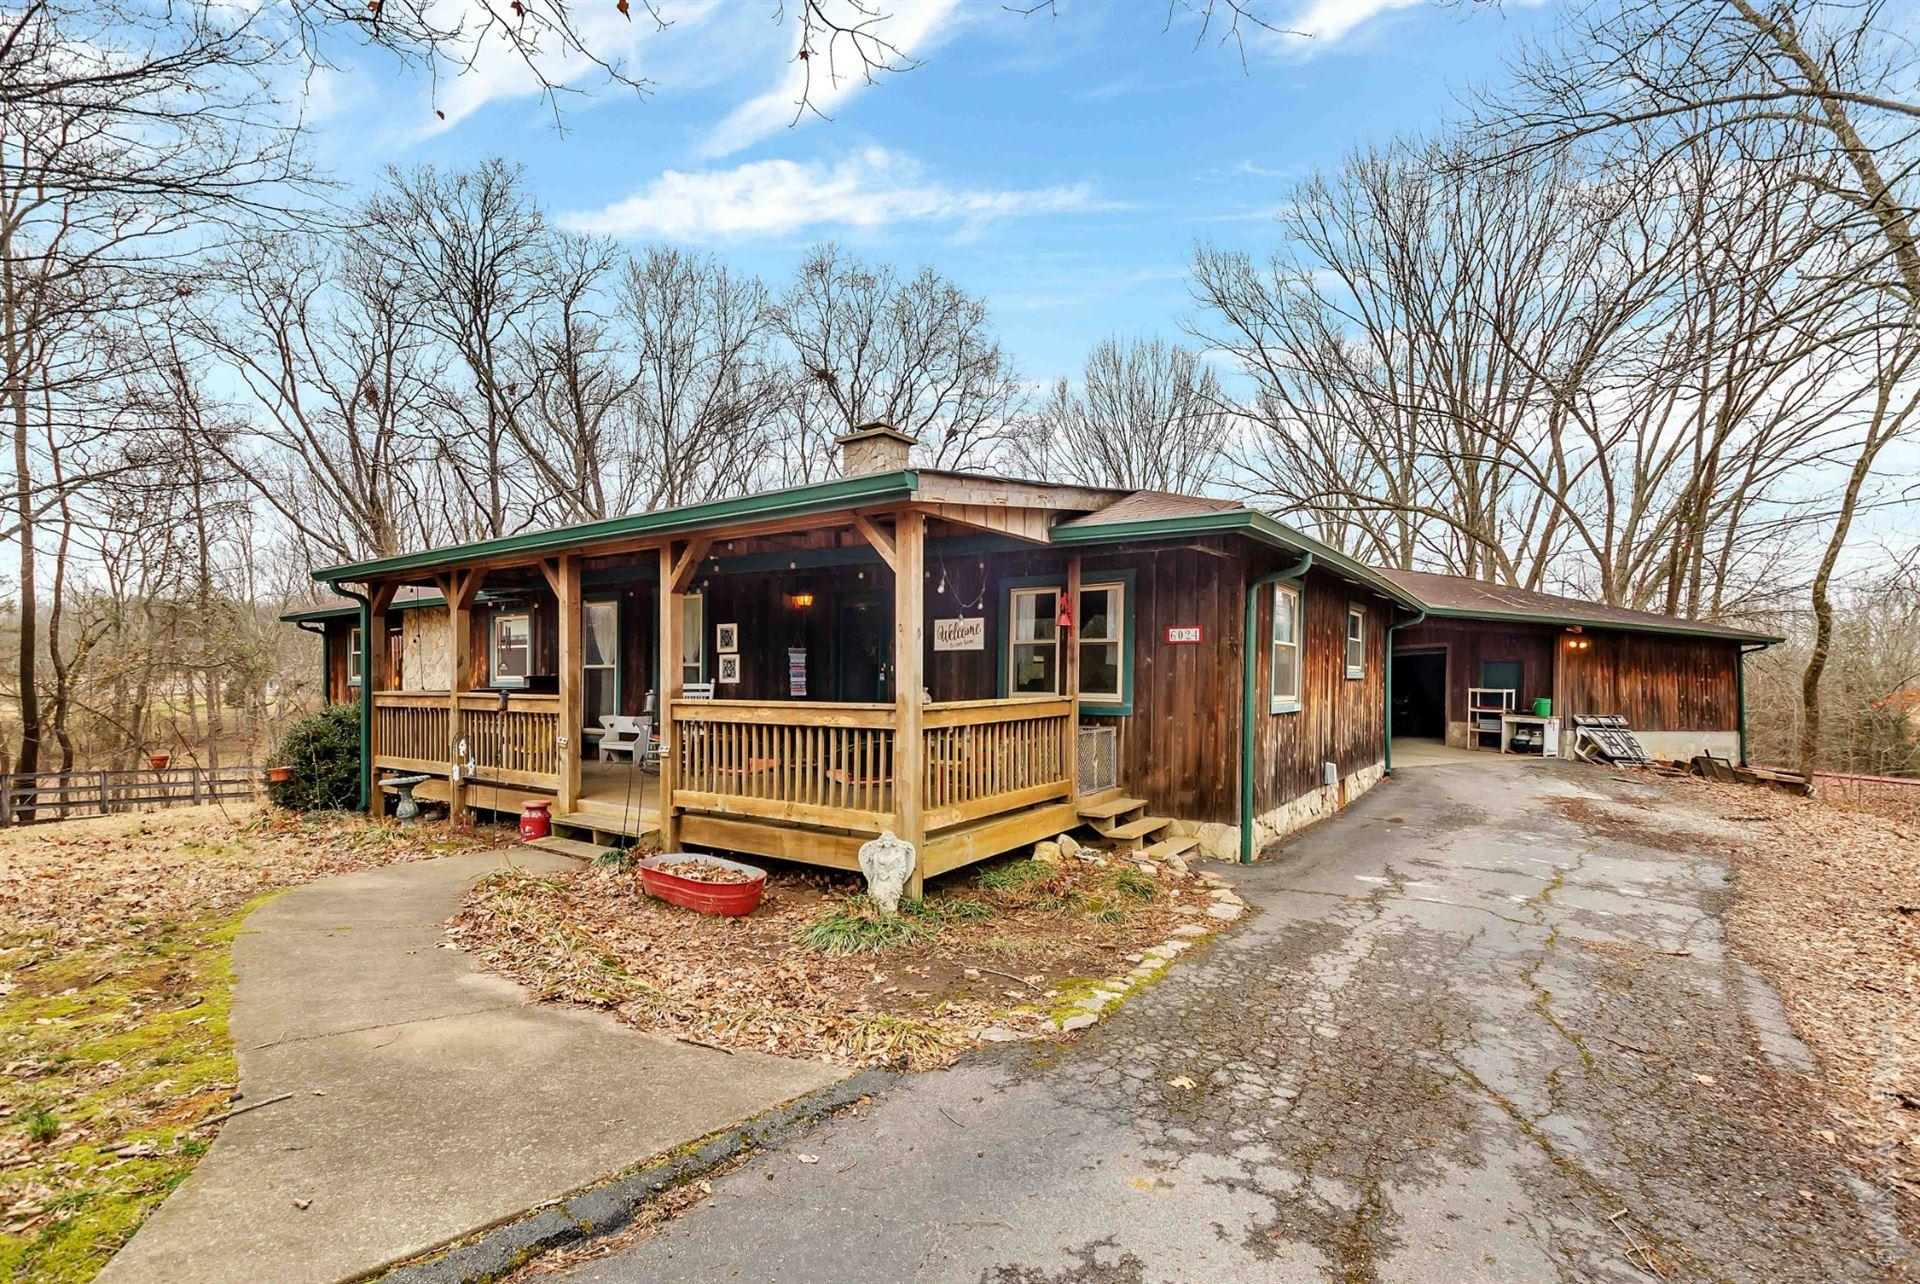 6024 Cane Ridge Rd, Antioch, TN 37013 - MLS#: 2227082